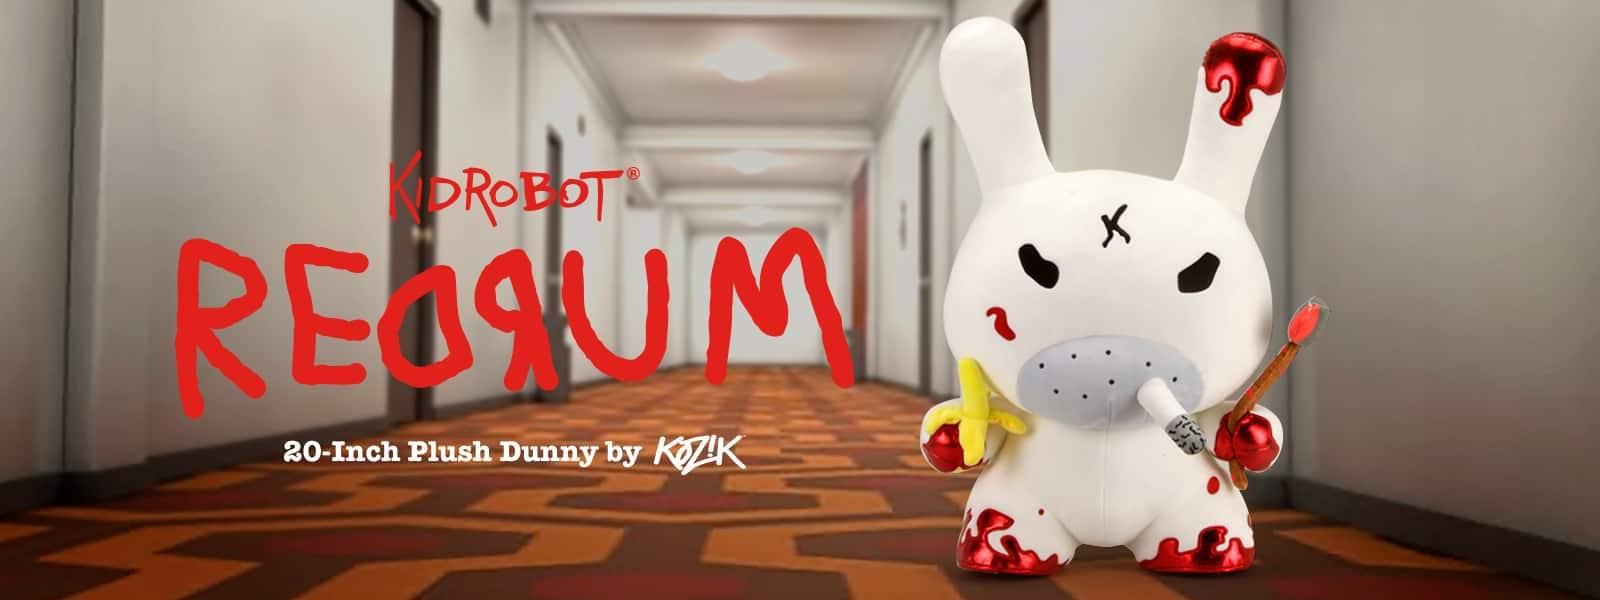 Kidrobot REDRUM 20-inch Plush Dunny by Frank Kozik